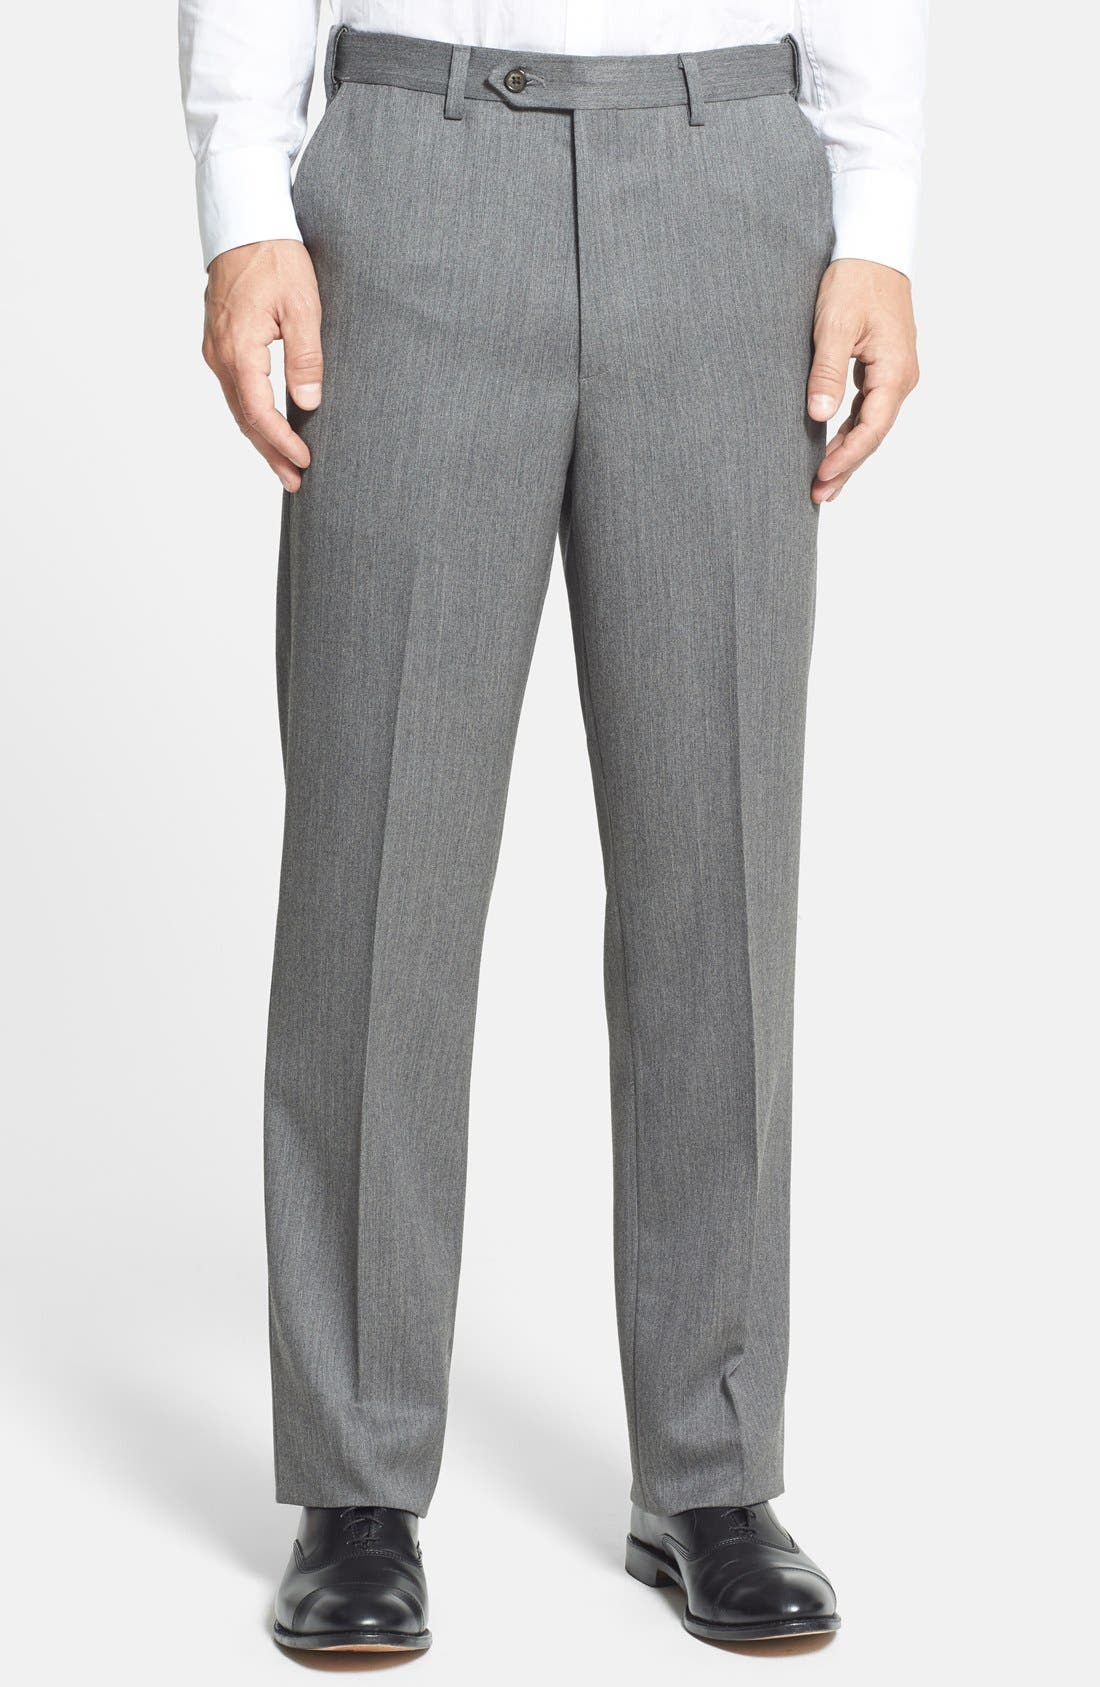 Alternate Image 1 Selected - Berle Self Sizer Waist Flat Front Wool Gabardine Trousers